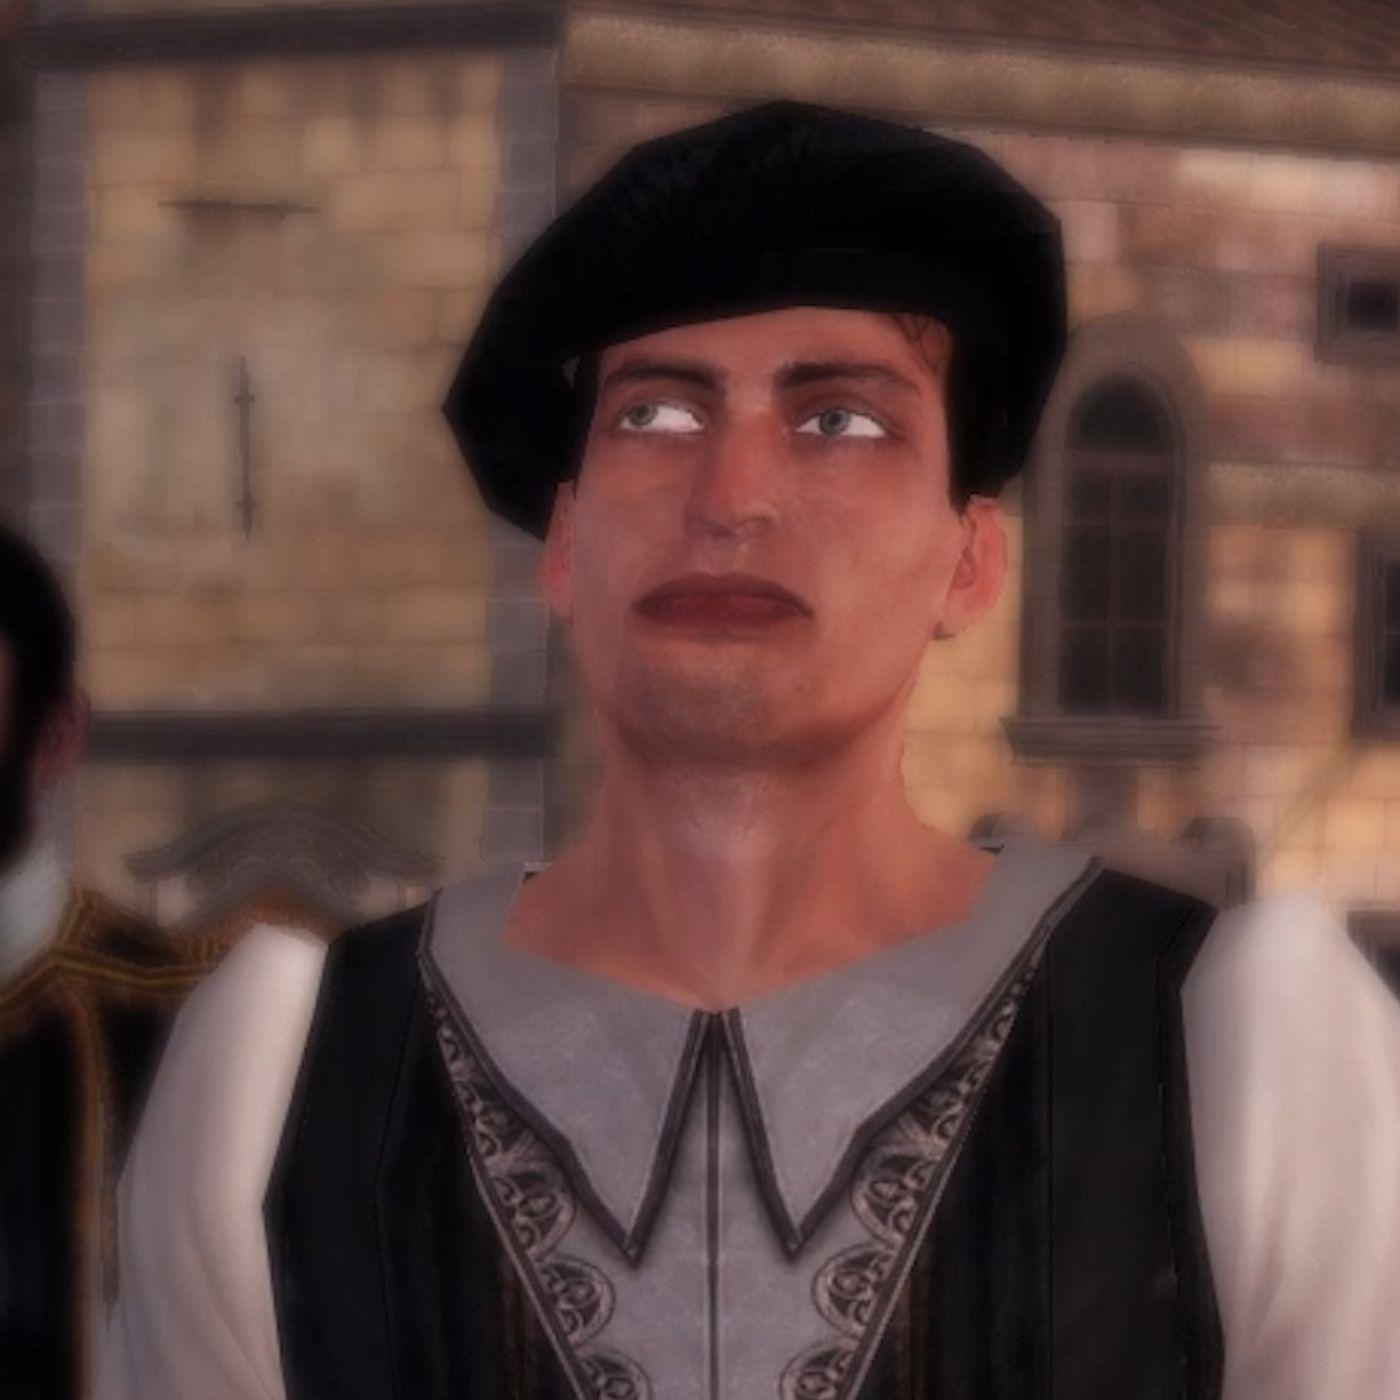 The Assassin S Creed 2 Remaster Got Weird Update Polygon